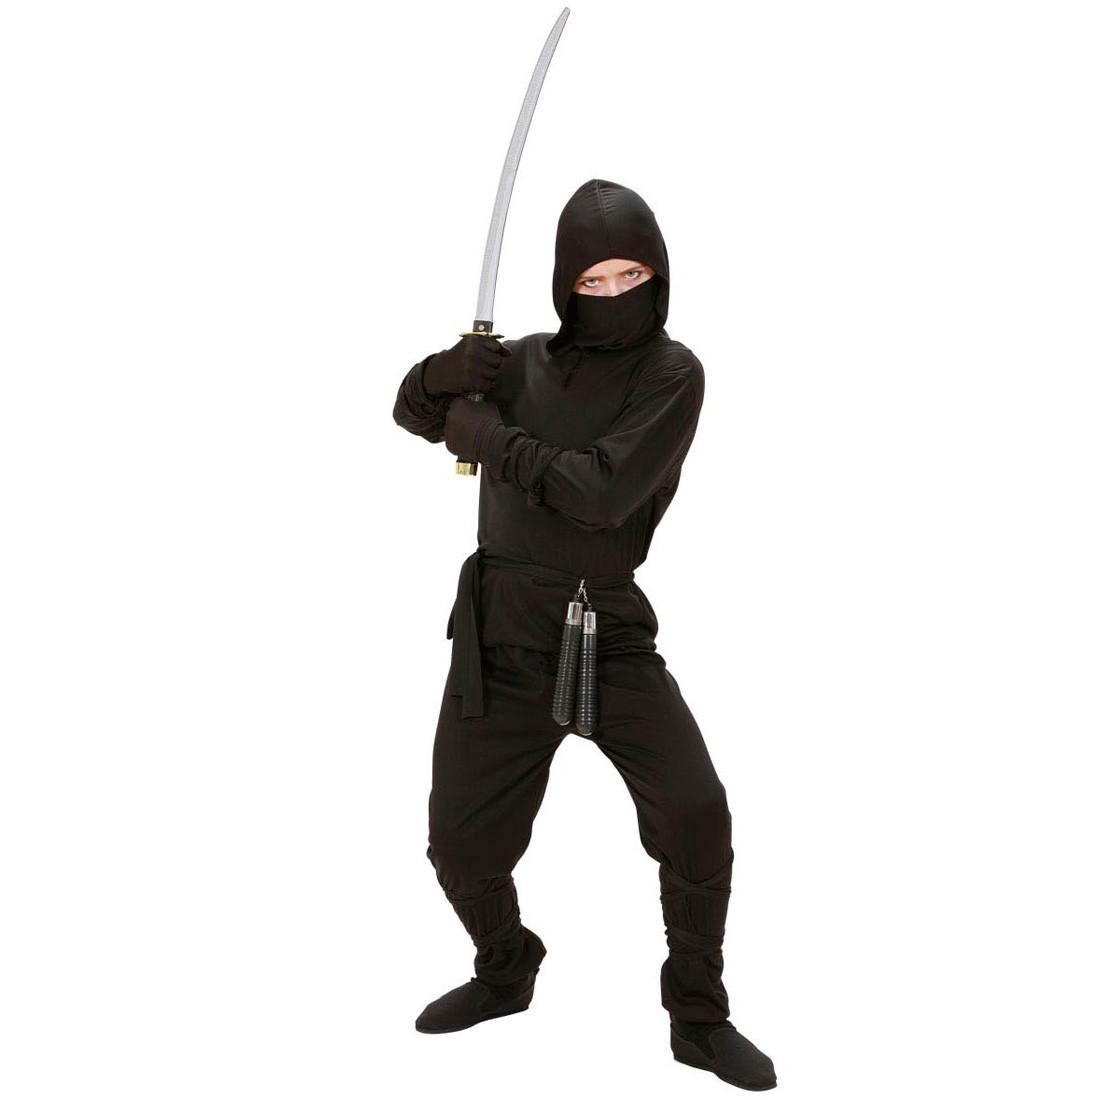 ninja kost m kinderkost m ninjakost m m 140cm 13 49. Black Bedroom Furniture Sets. Home Design Ideas